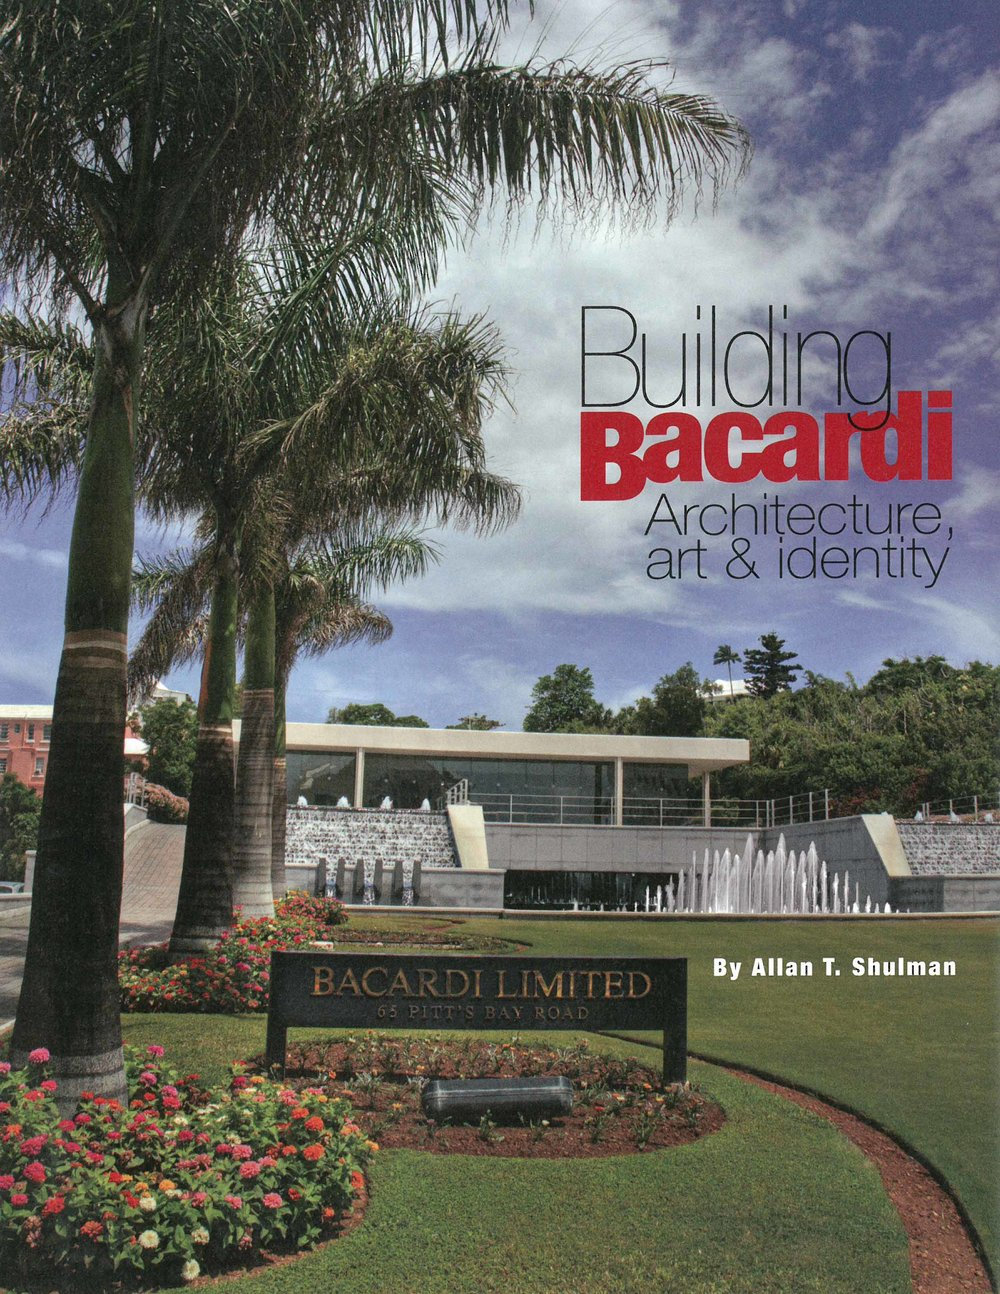 Allan Shulman, Building Bacardi architecture, art & identity, Modern Magazine, 2013 fall      MORE >>